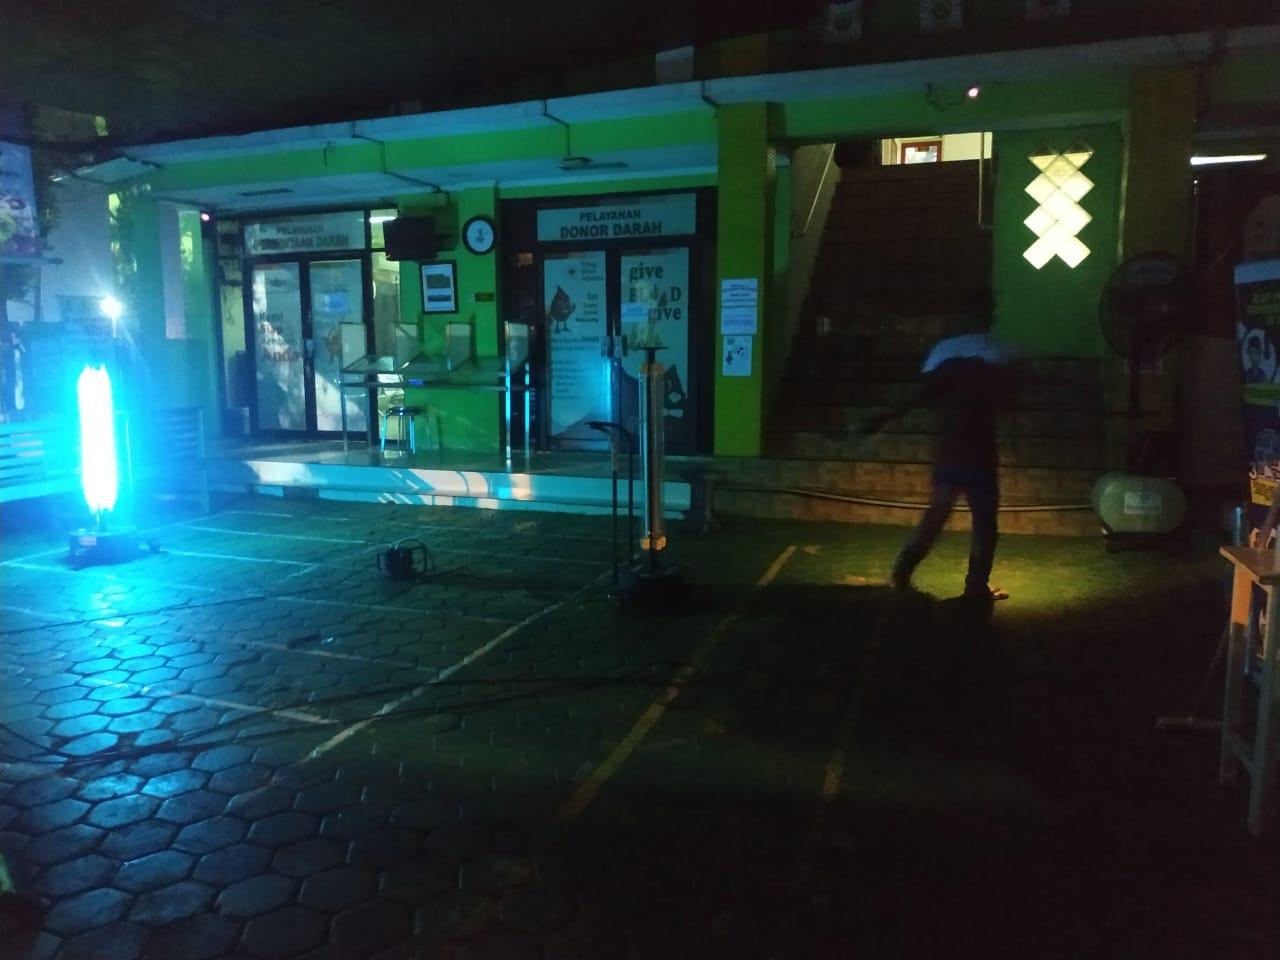 Petugas PMI Kota Tangerang sedang memanfaatkan sinar ultraviolet untuk sterilisasi ruangan sehingga dapat mencegah penyebaran virus dan bakteri, Selasa (16/6/2020).